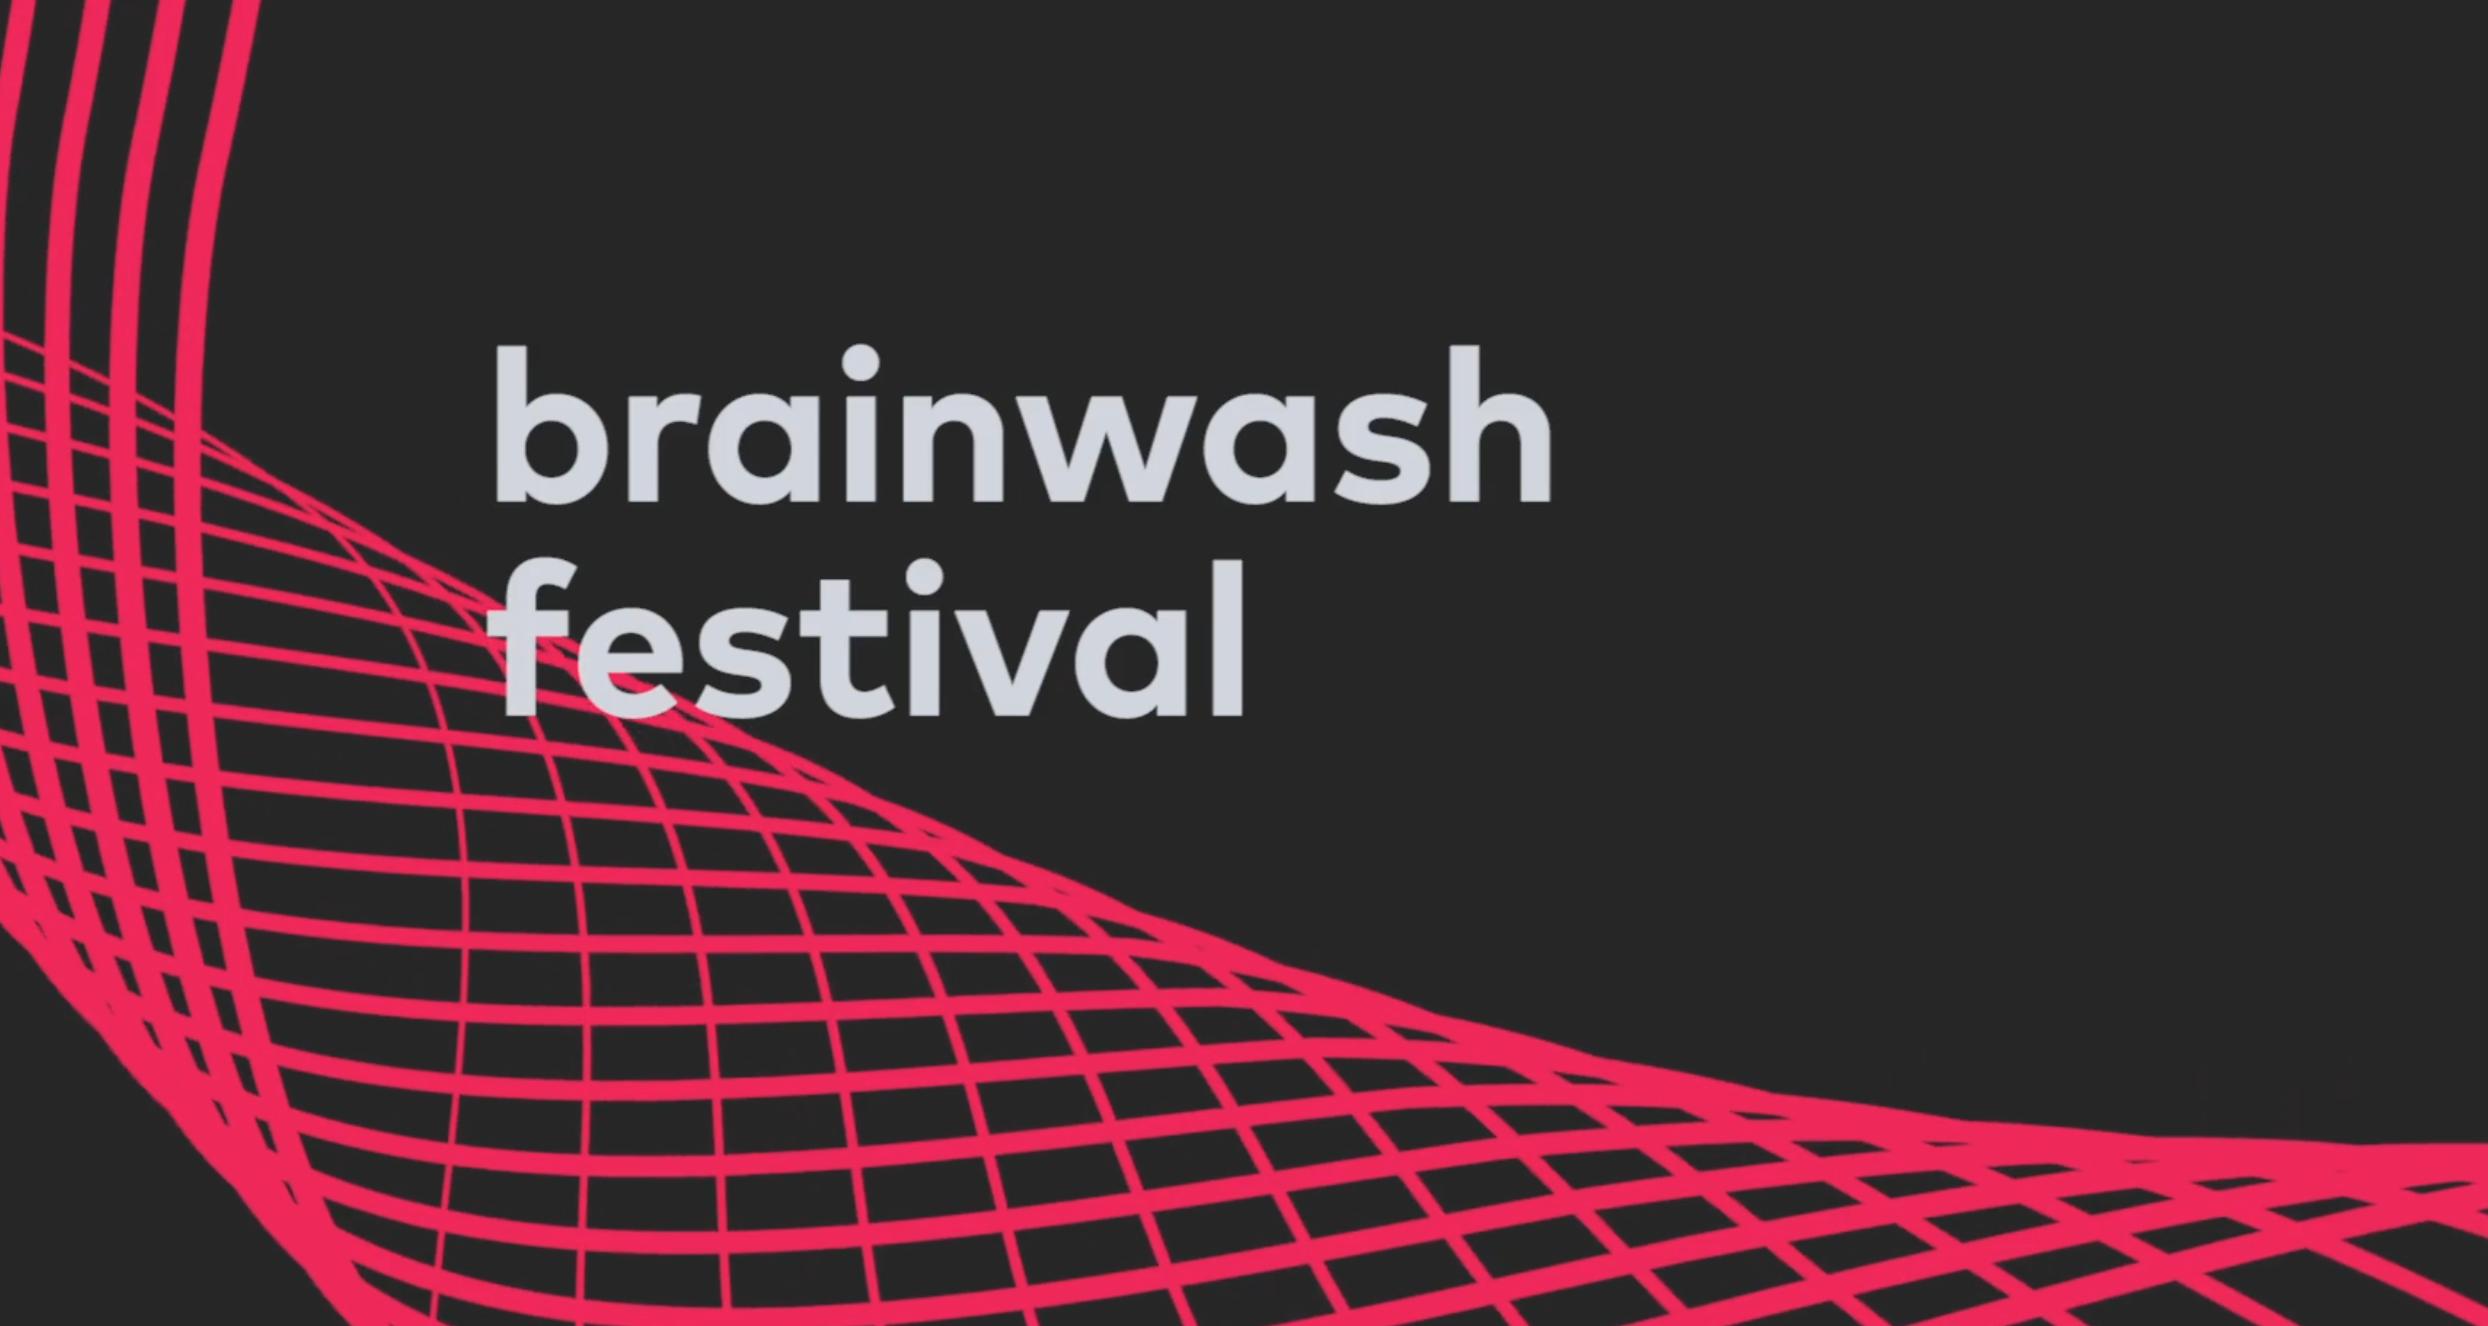 Brainwash Festival 2019